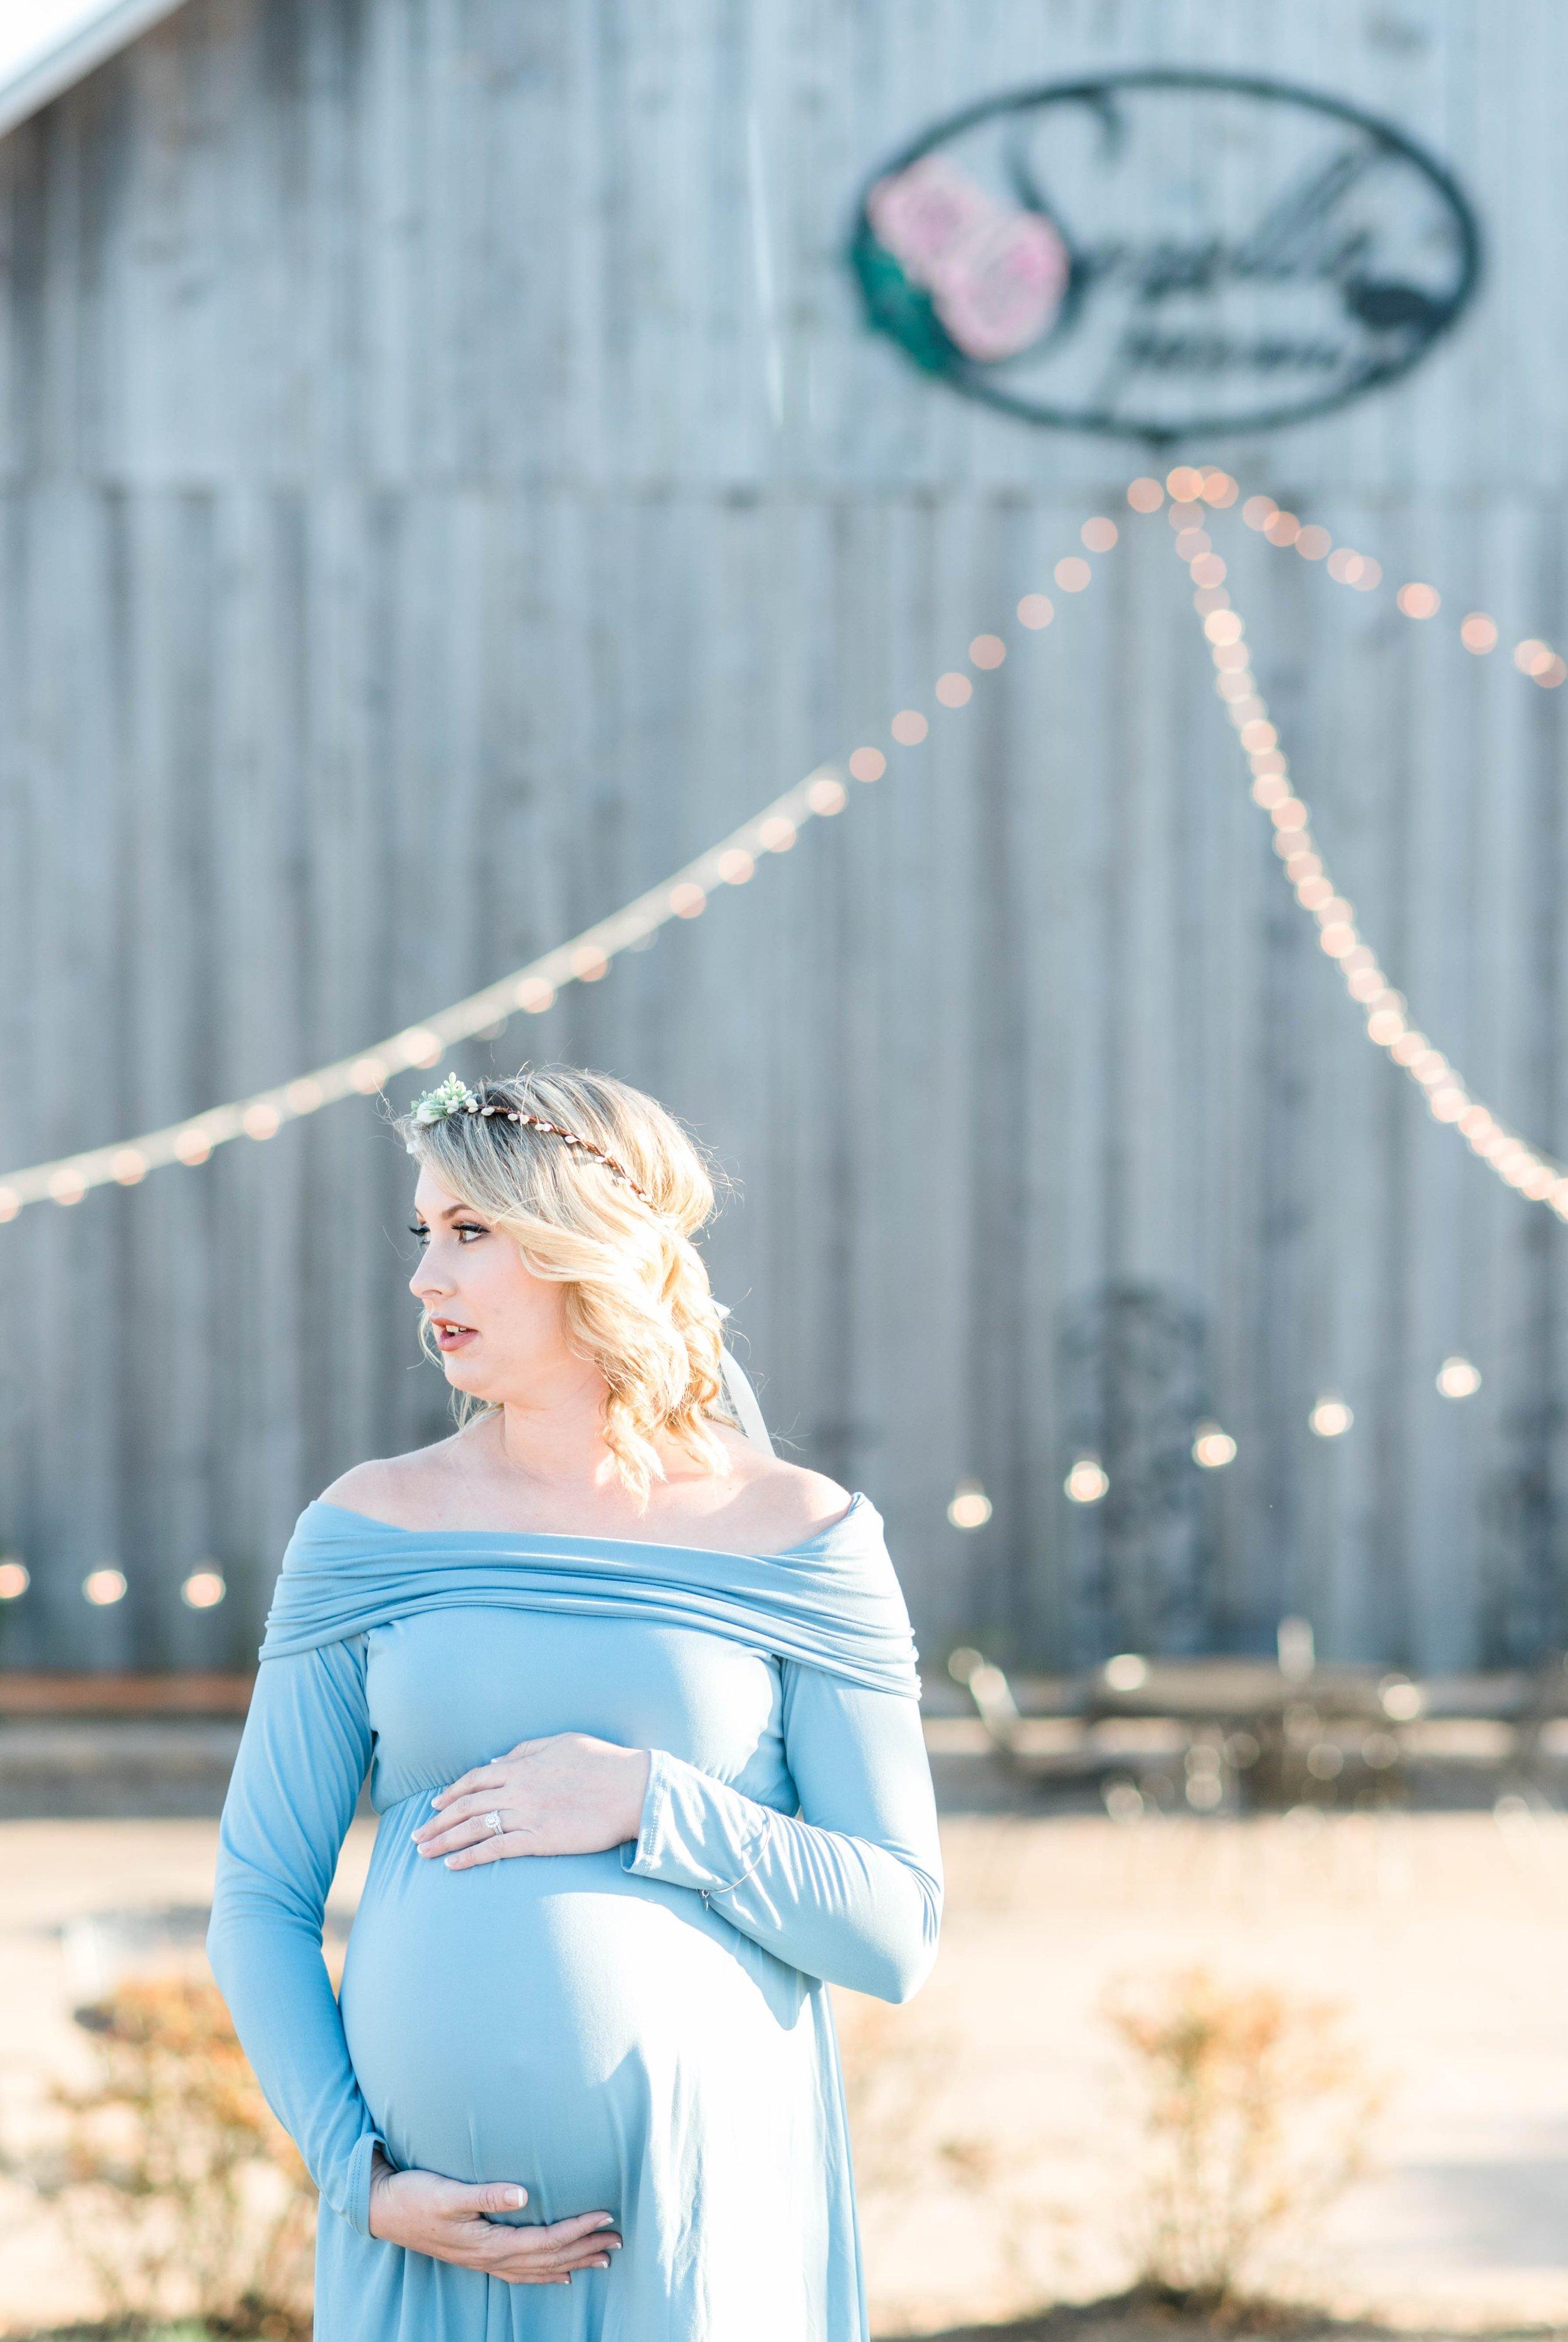 SorellaFarms_Jessica+Dylan_MaternitySession_Virginiaweddingphotographer 22.jpg